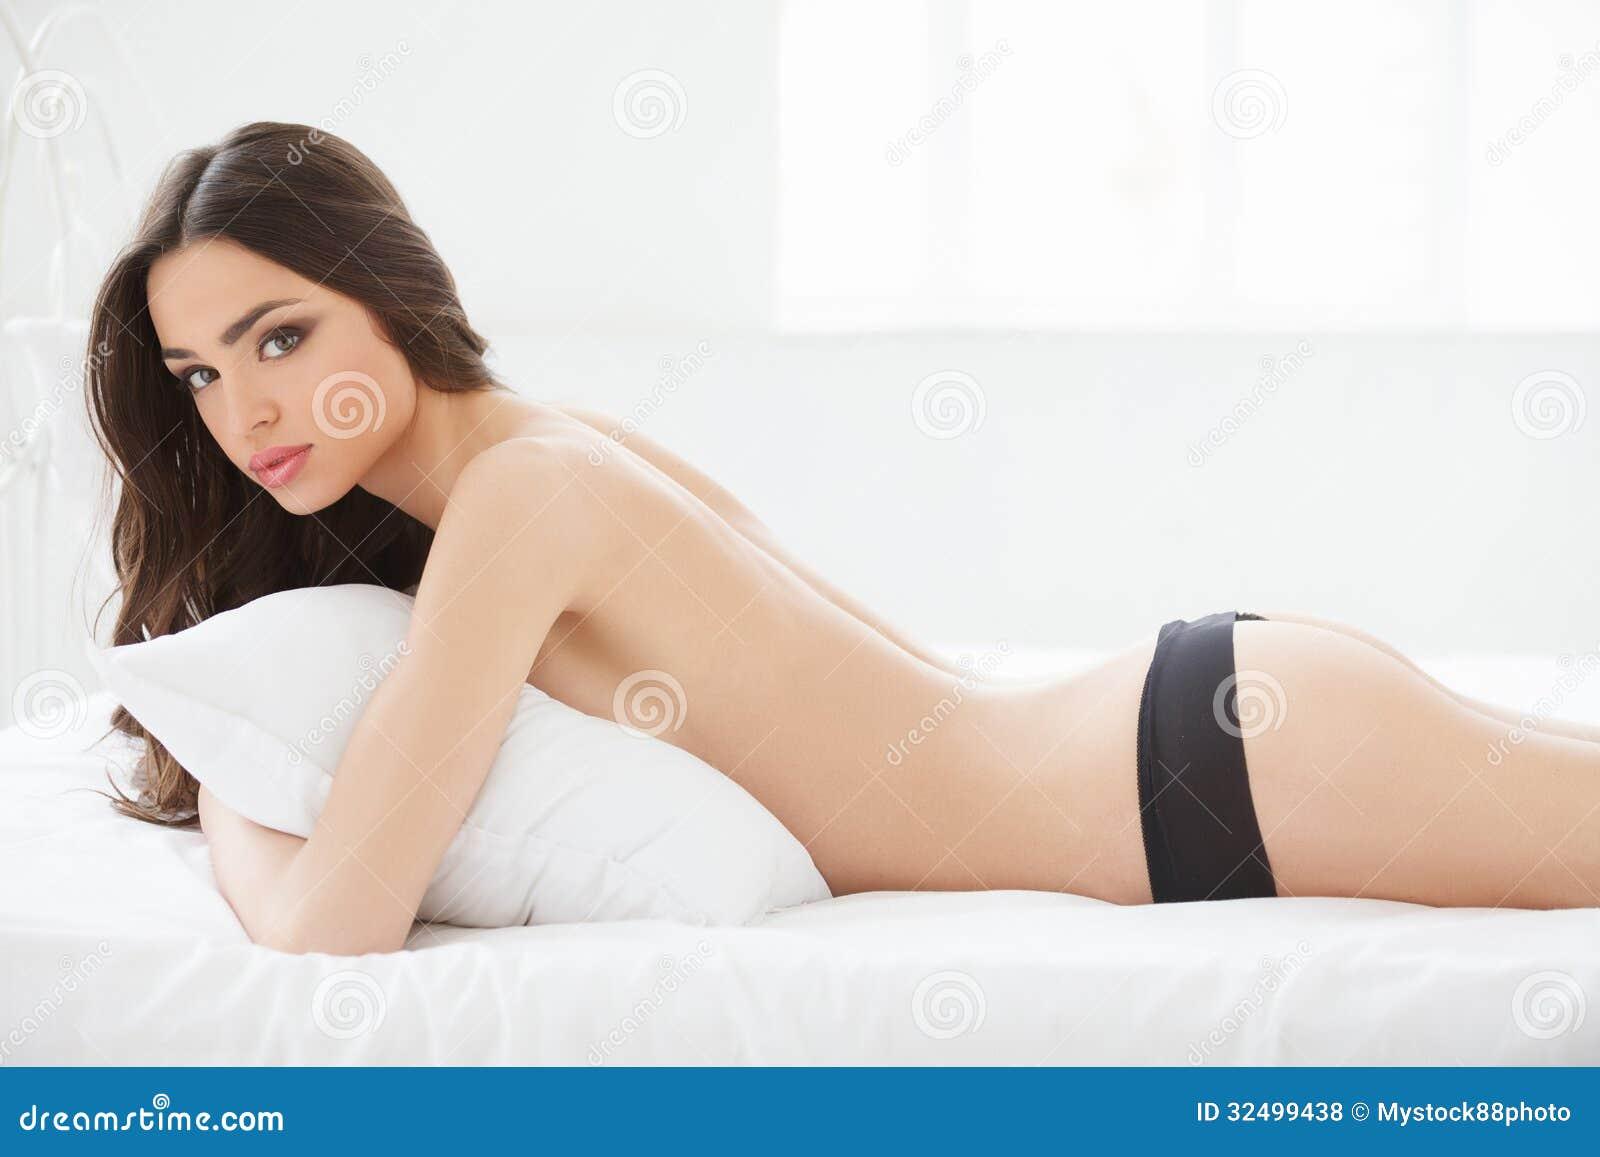 Woman Cummin All Over Guy